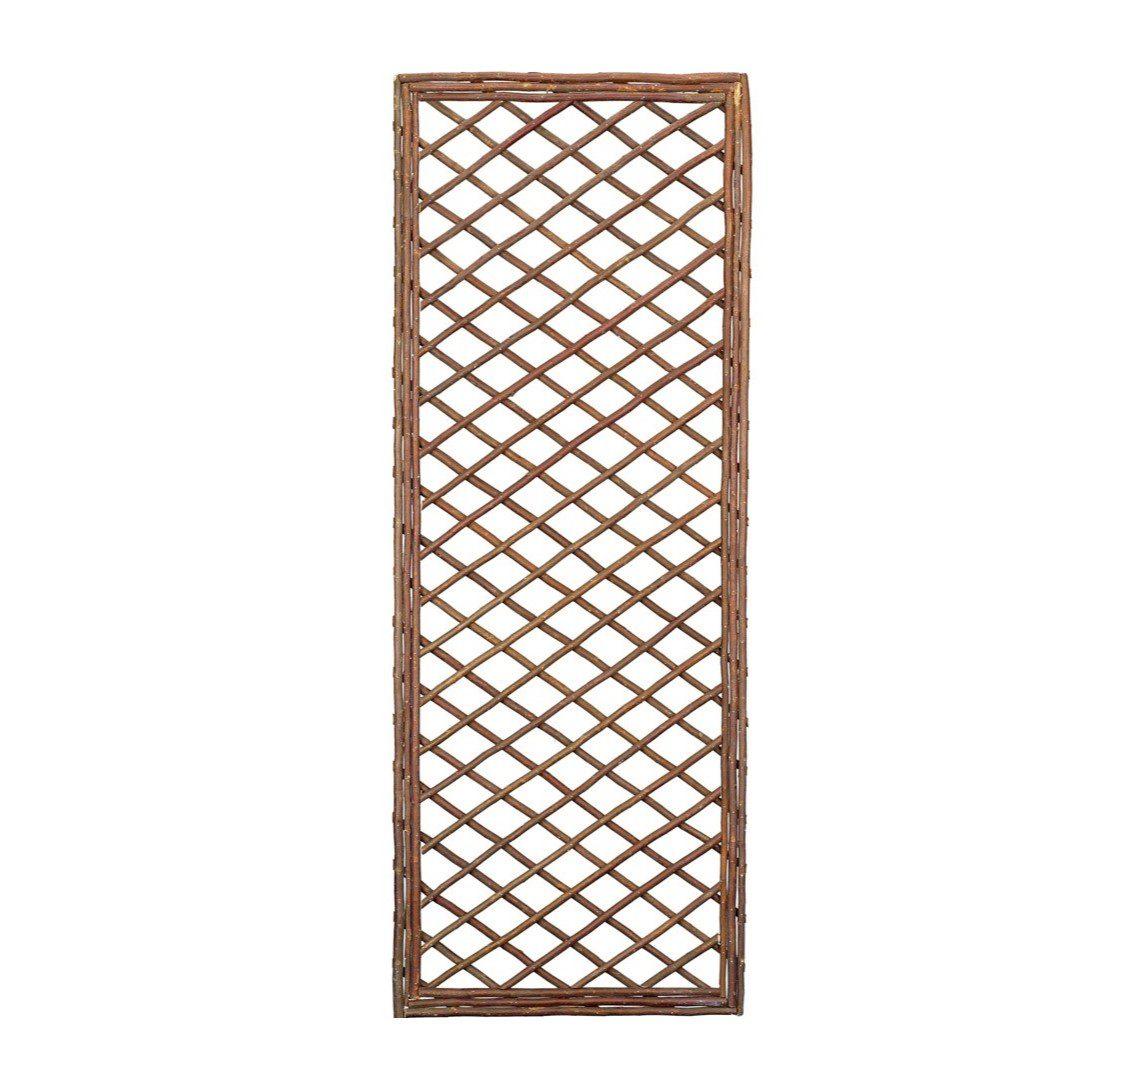 Gardman 1.8m x 0.6m Framed Willow Trellis Panel